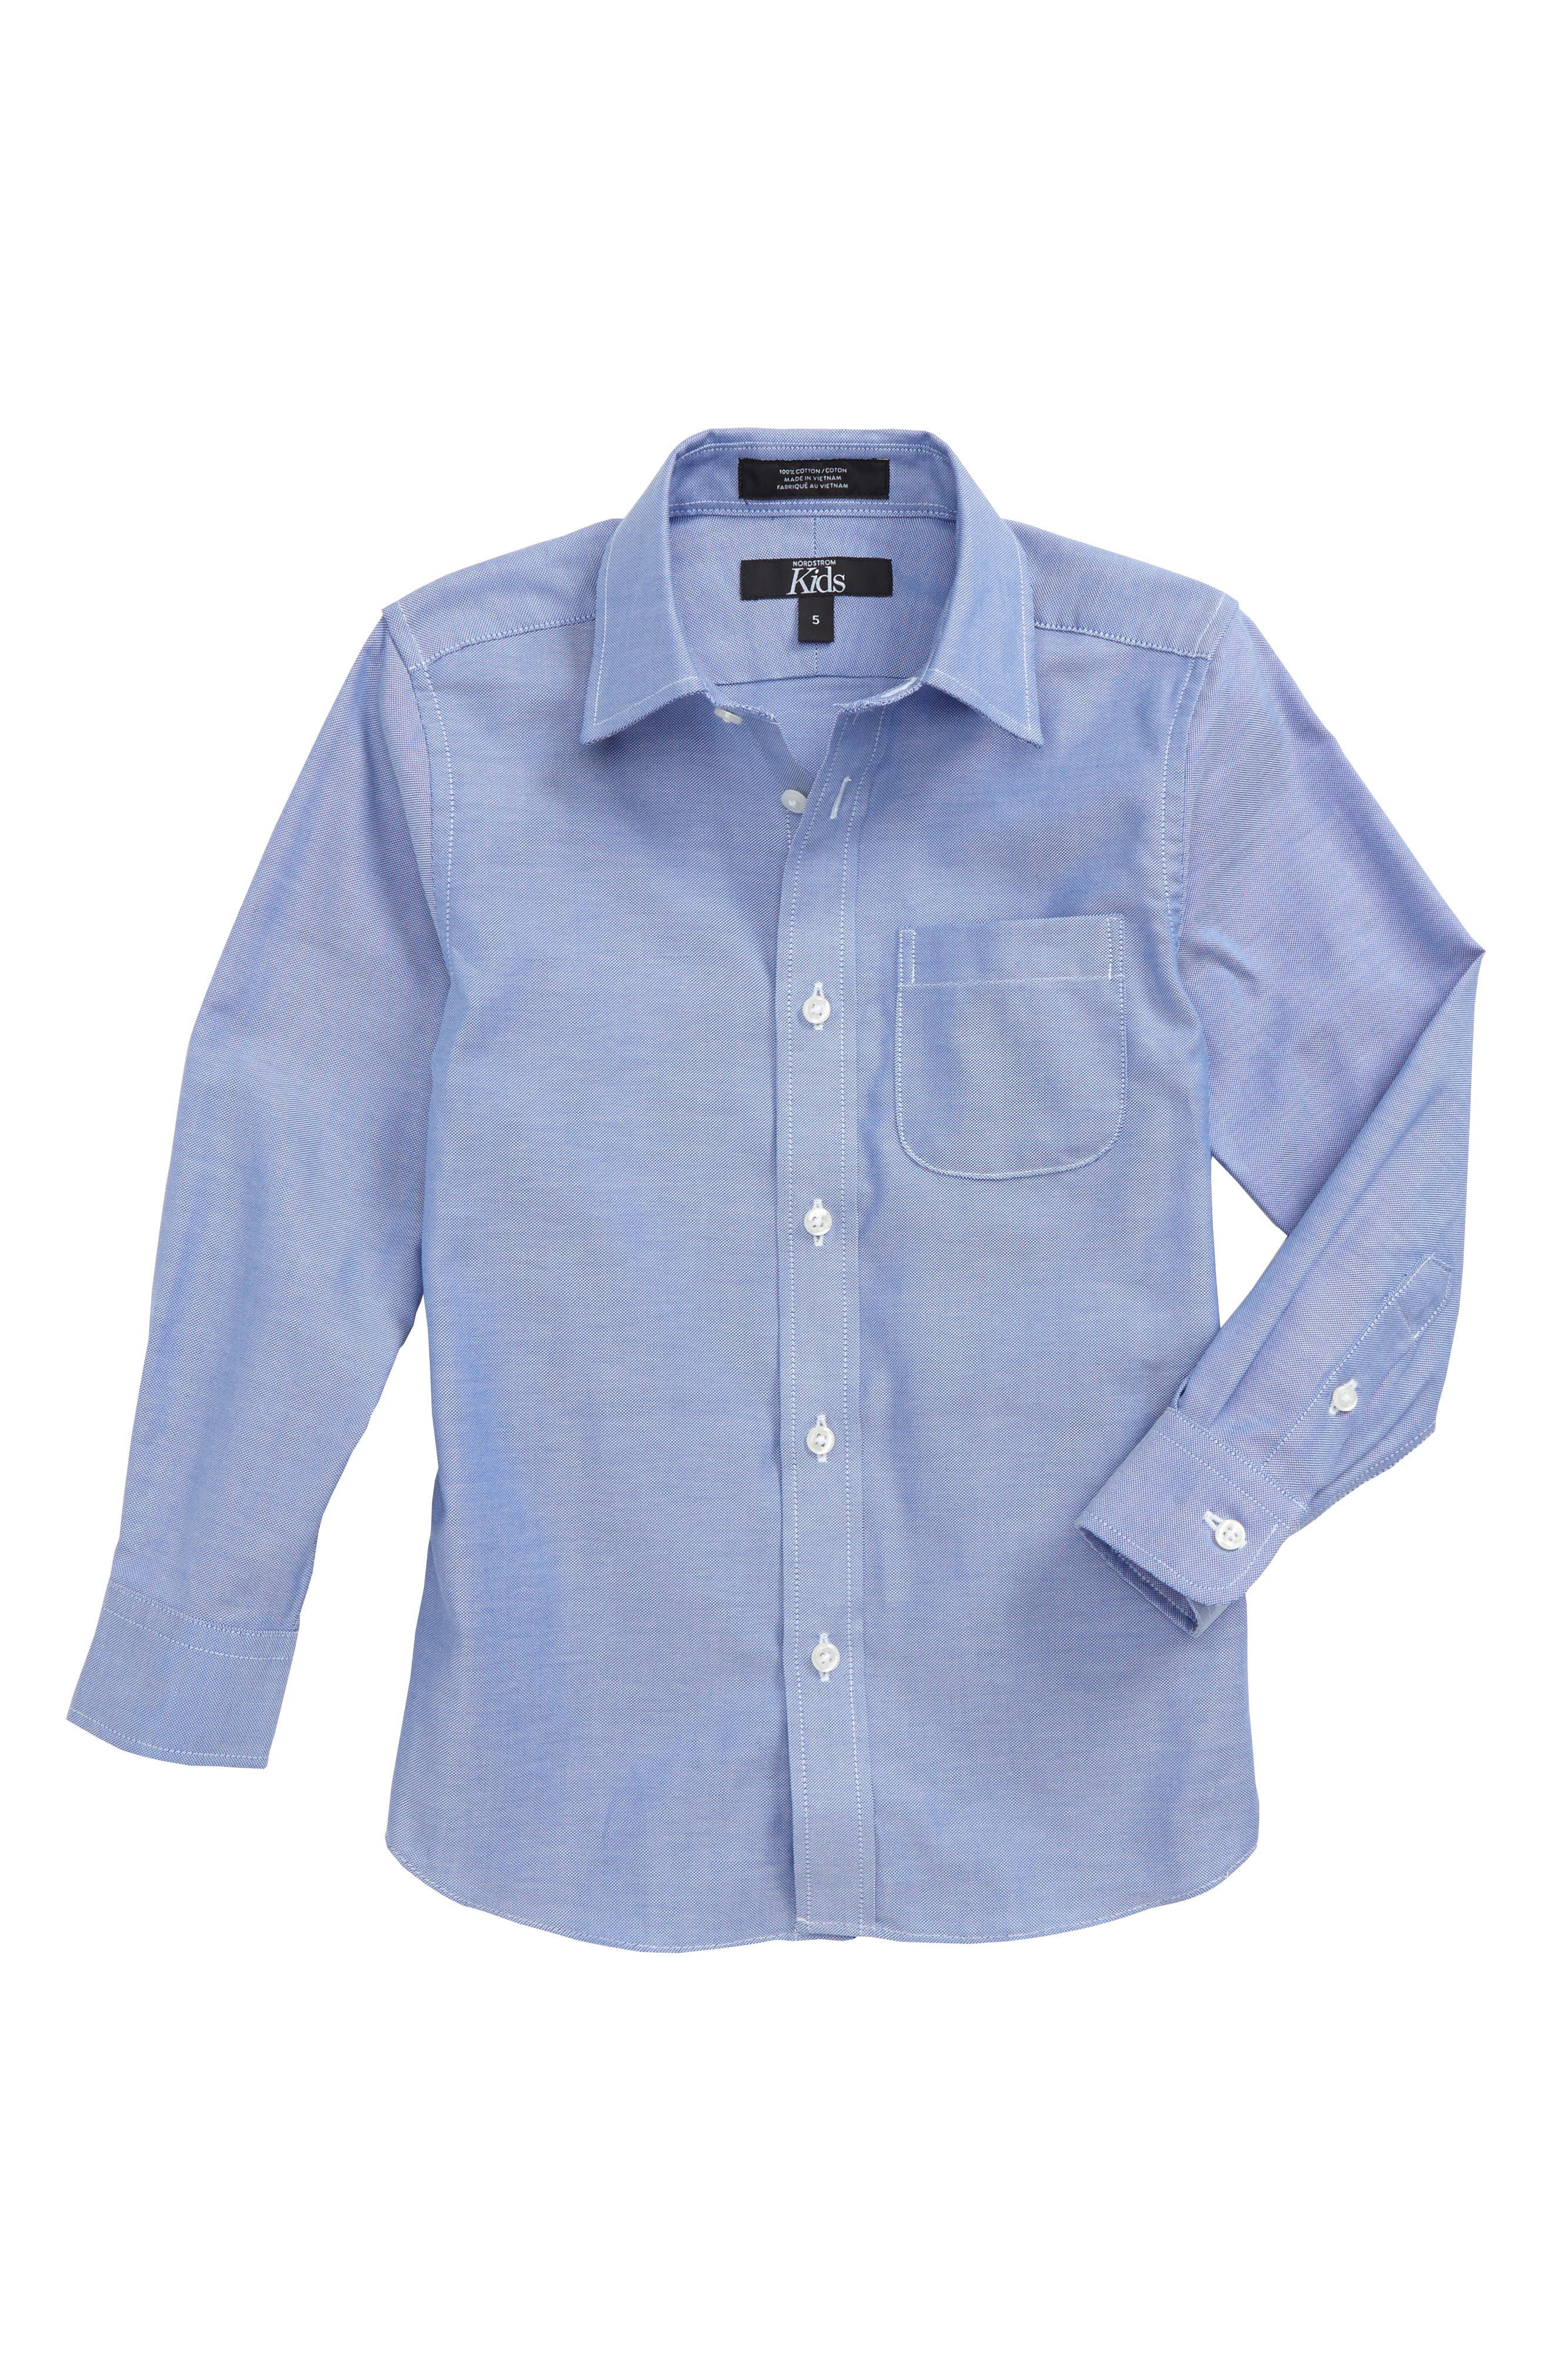 Alternate Image 1 Selected - Nordstrom Check Dress Shirt (Big Boys)